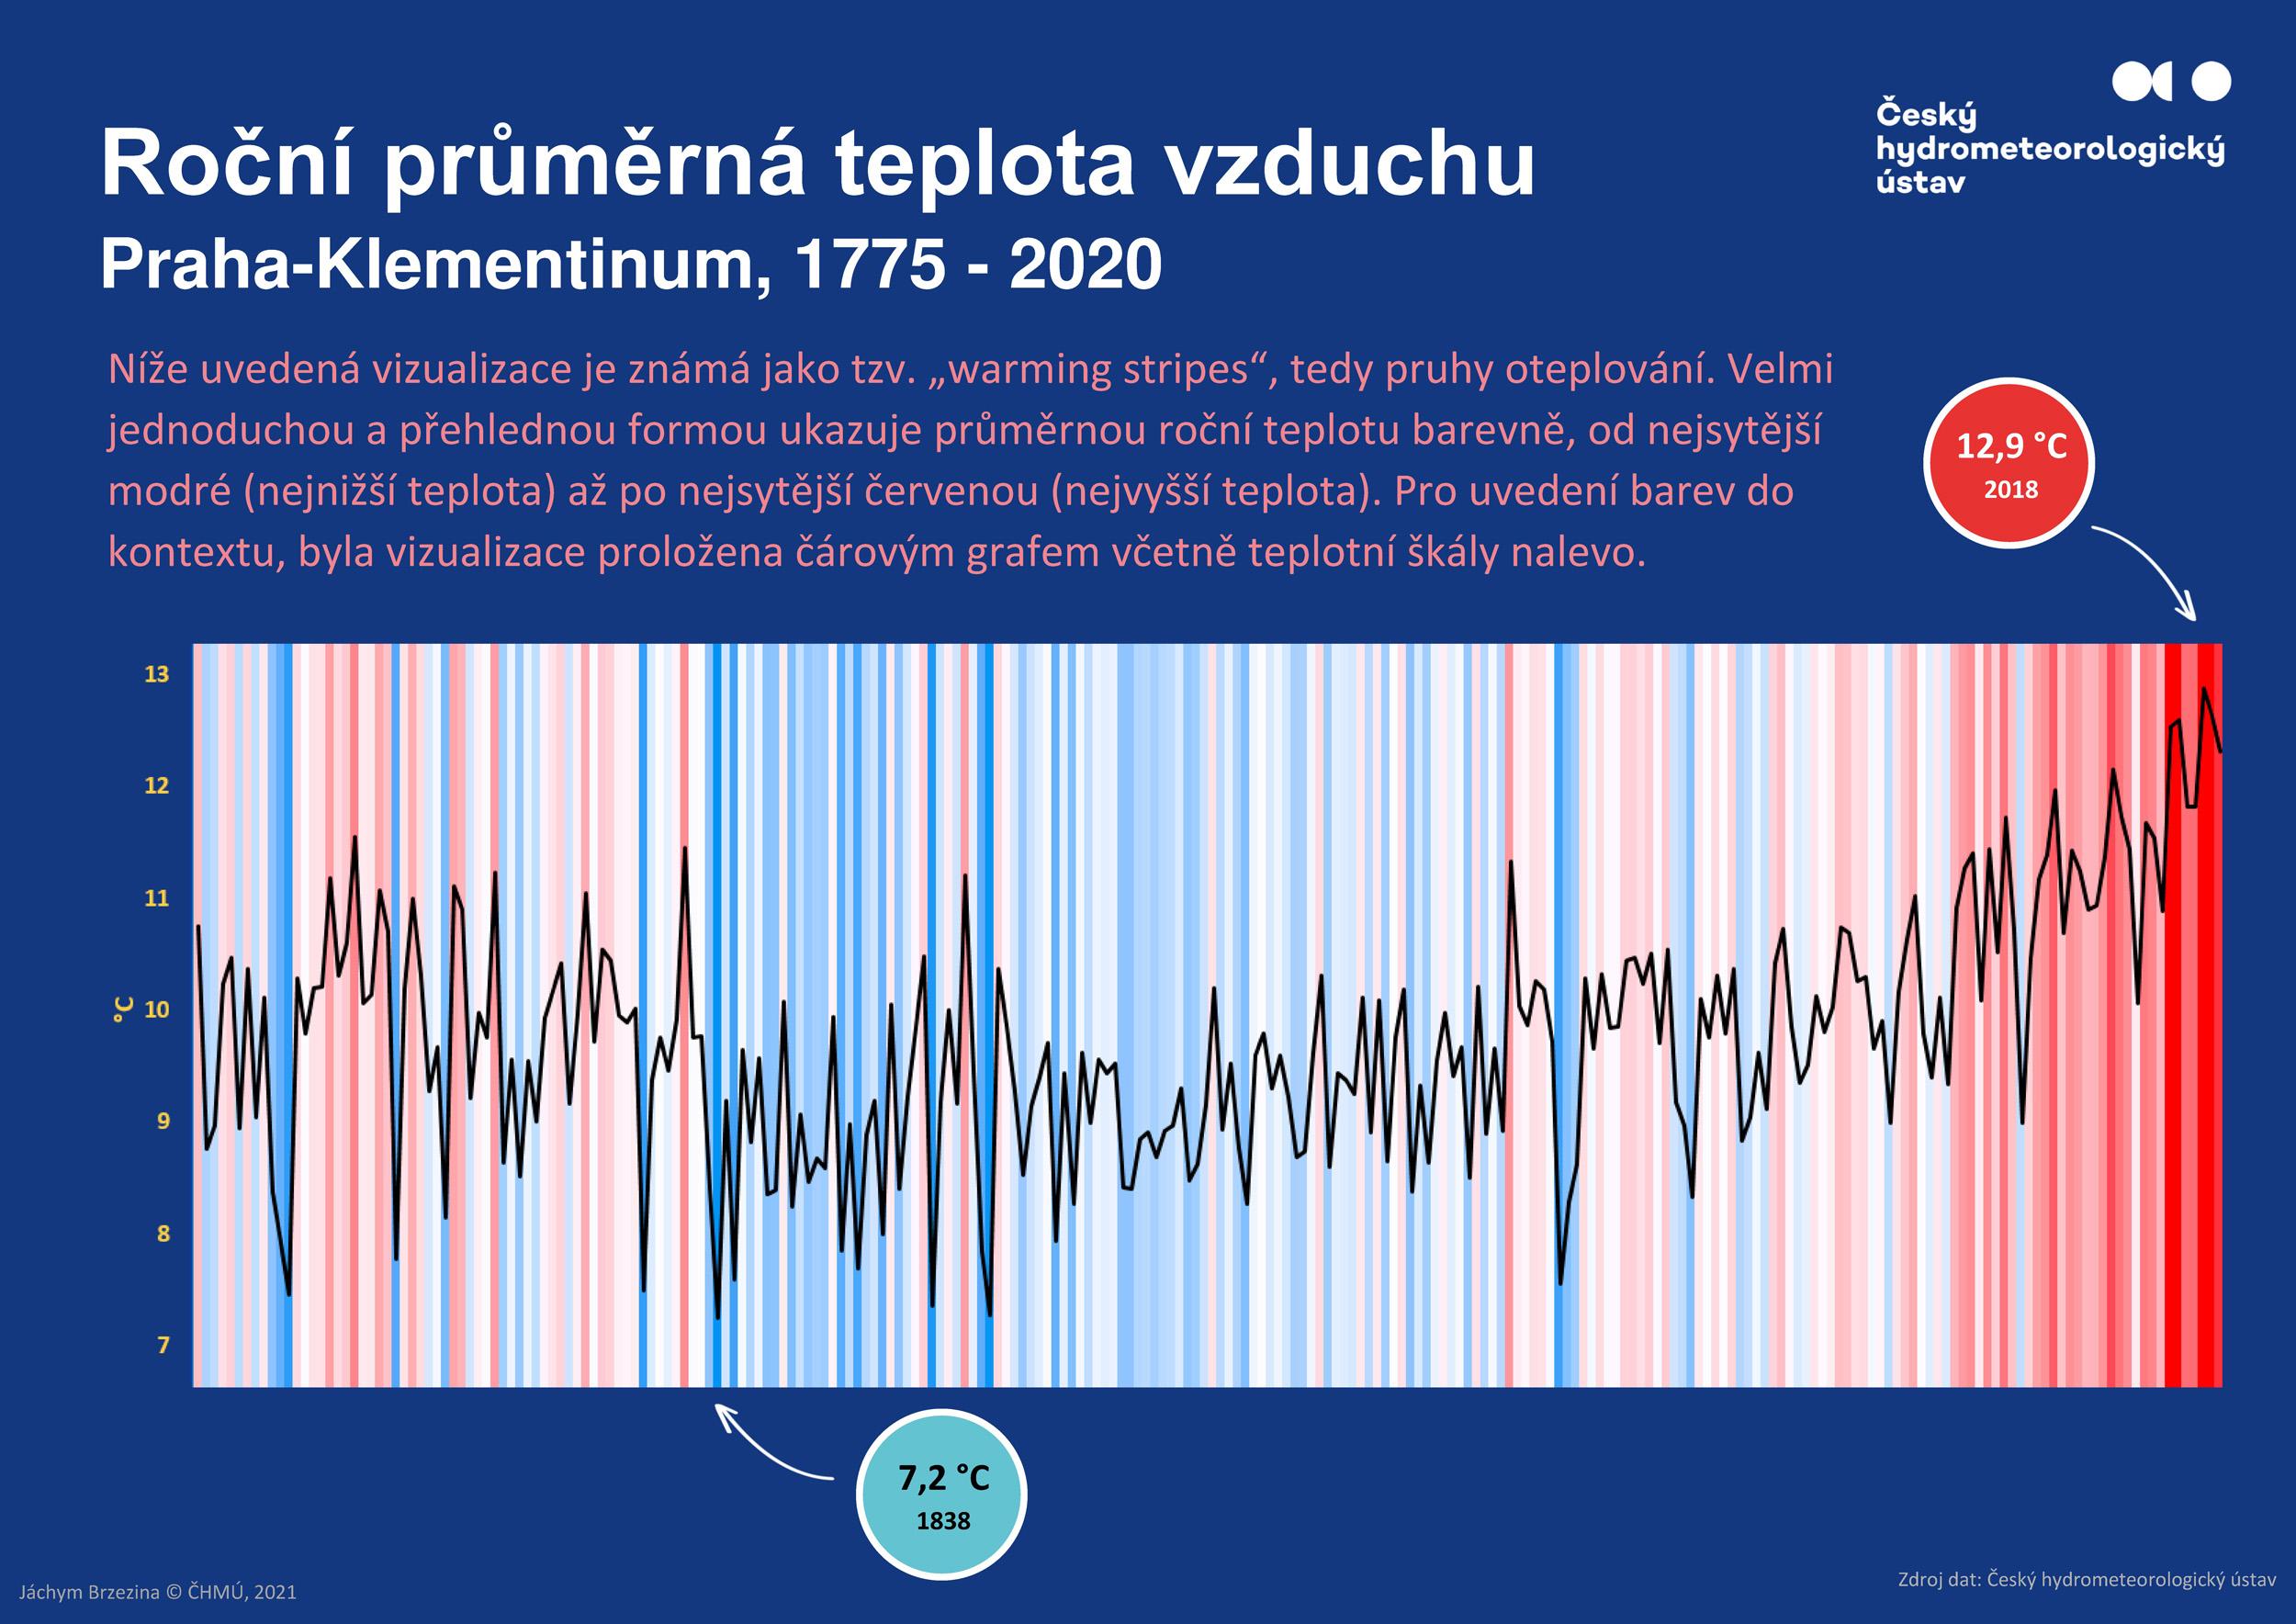 Warming stripes – Praha-Klementinum, 1775-2020